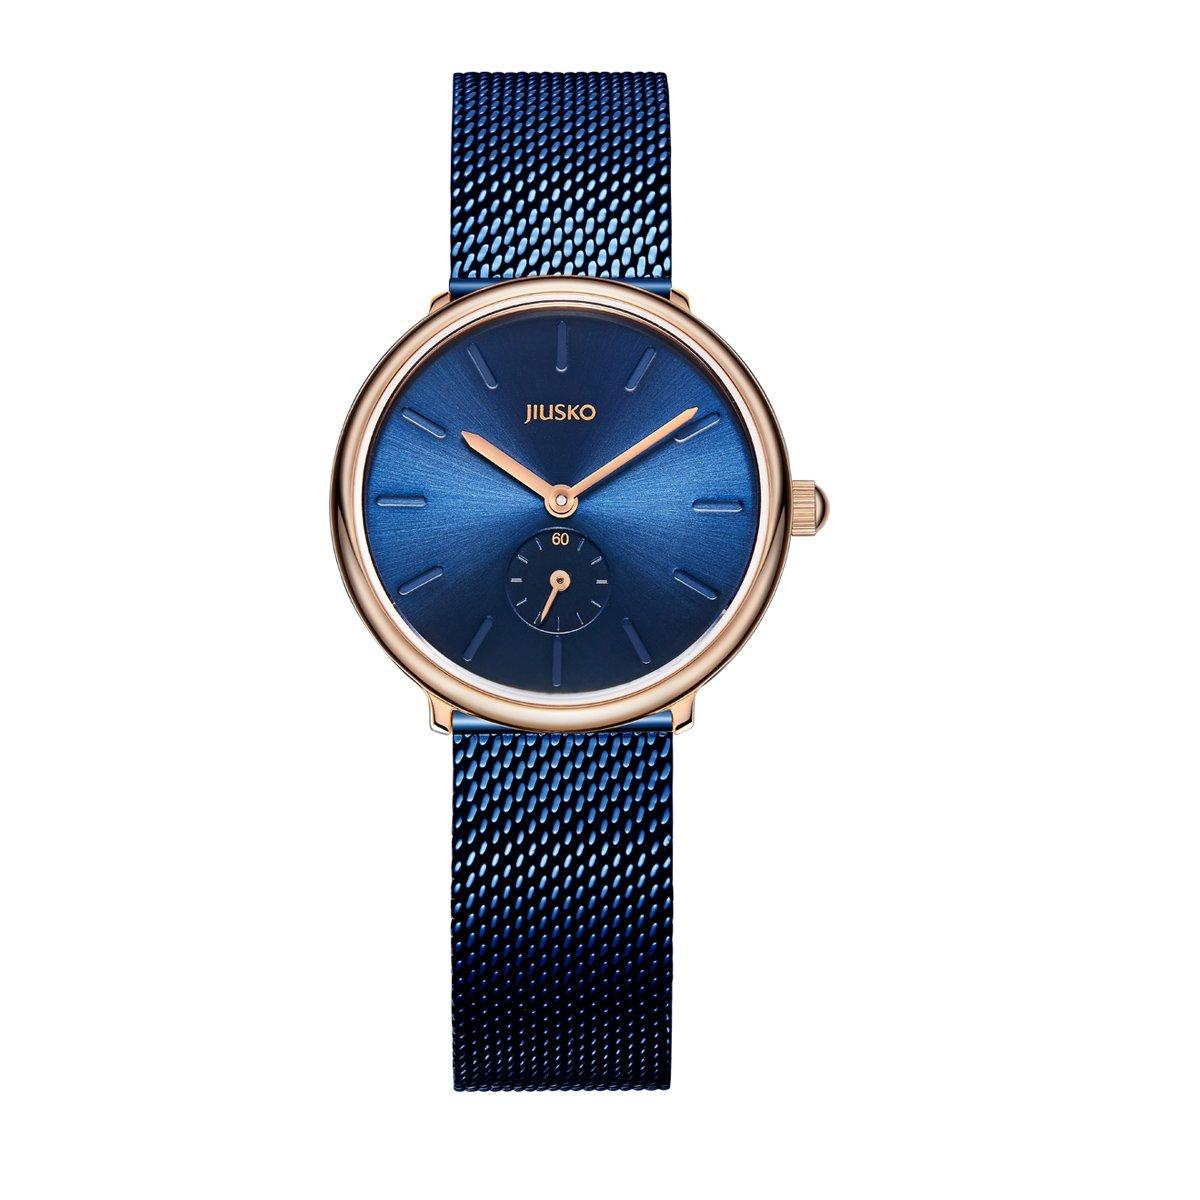 Jiusko Sapphire - Women's Quartz Dress Watch - Blue Steel Mesh - Rose Gold - 393